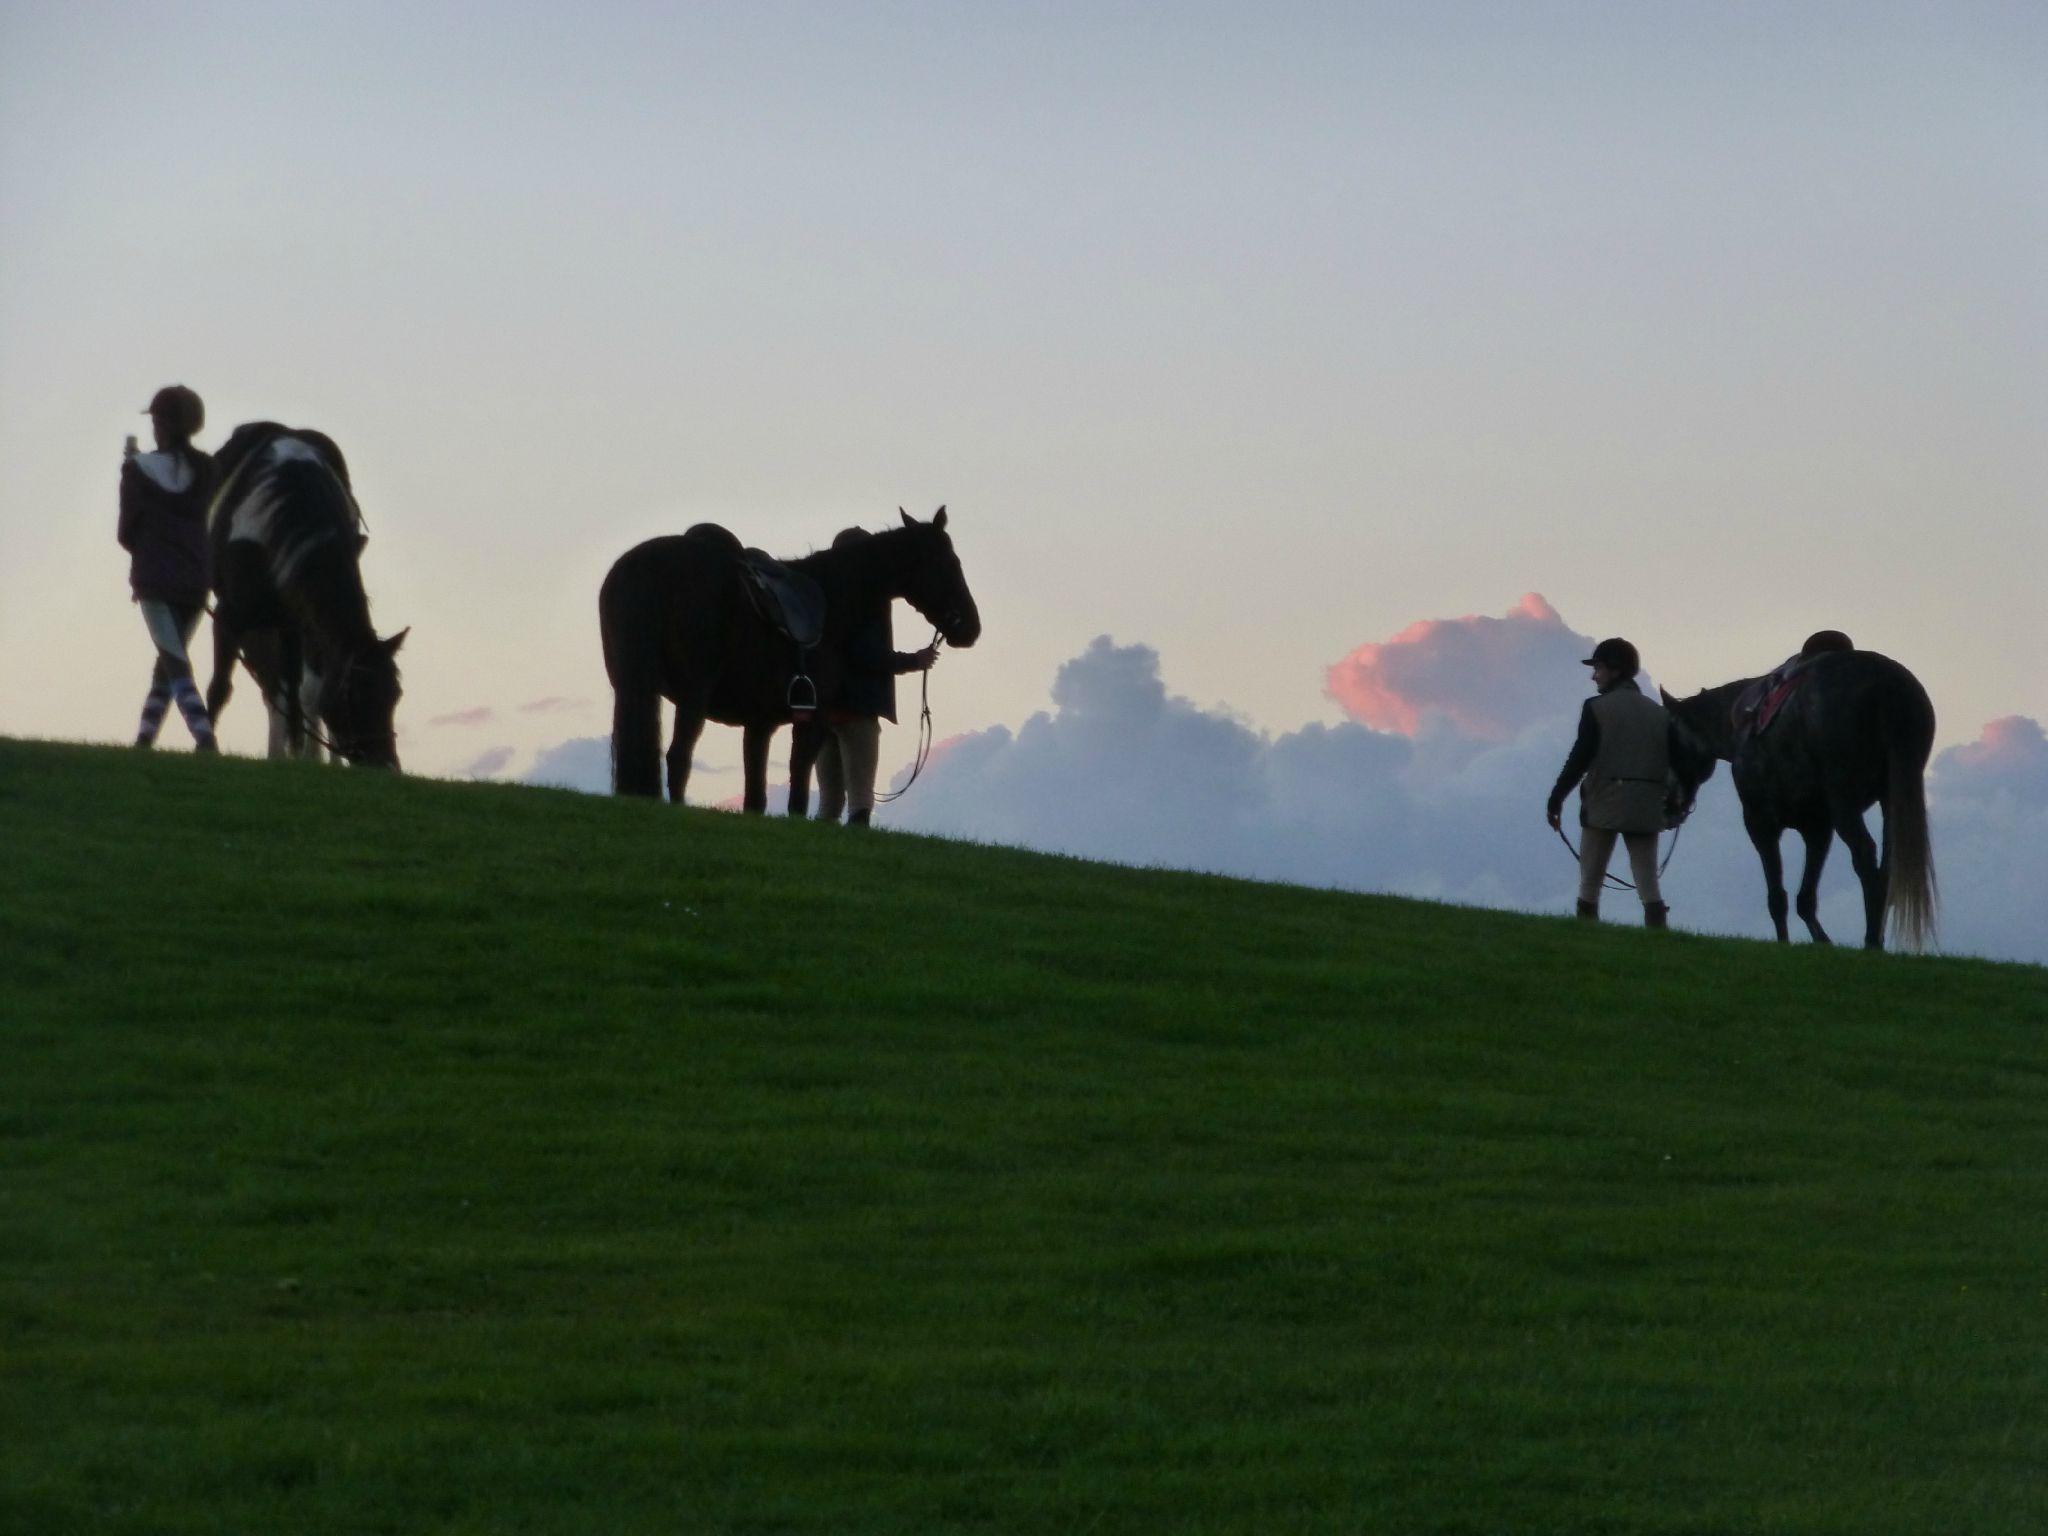 balade liberté - Mesnil Ozenne à cheval (59)